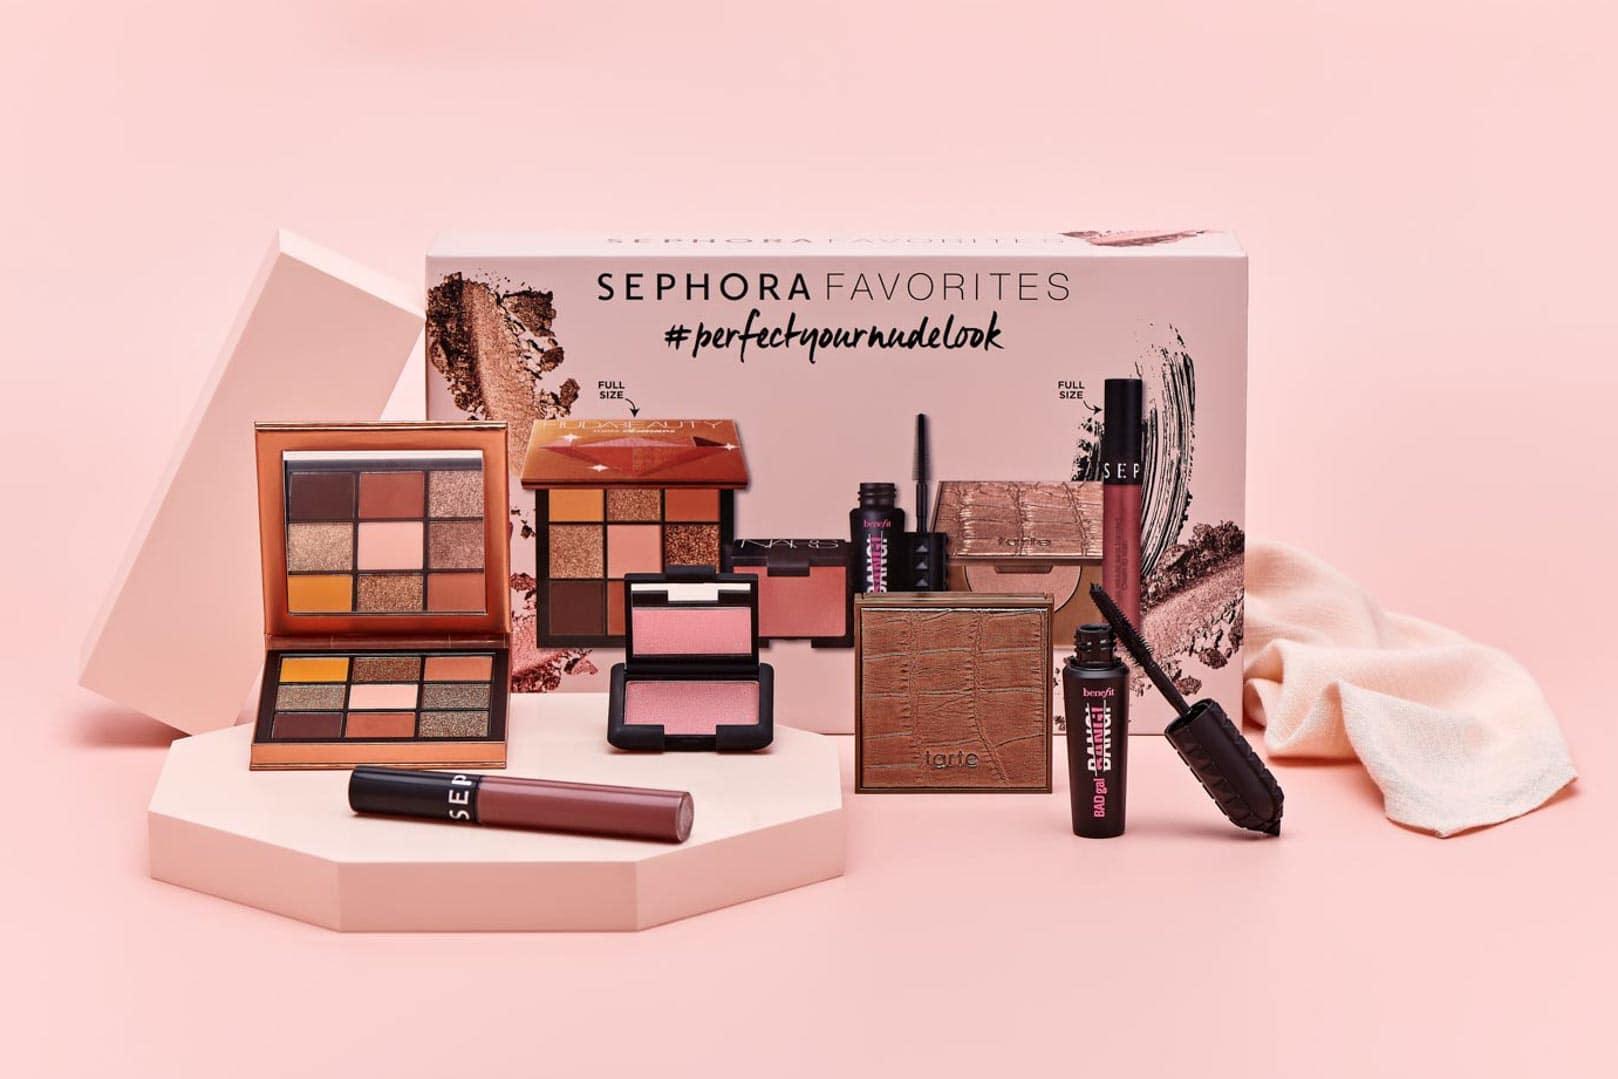 Sephora - Favurite Box